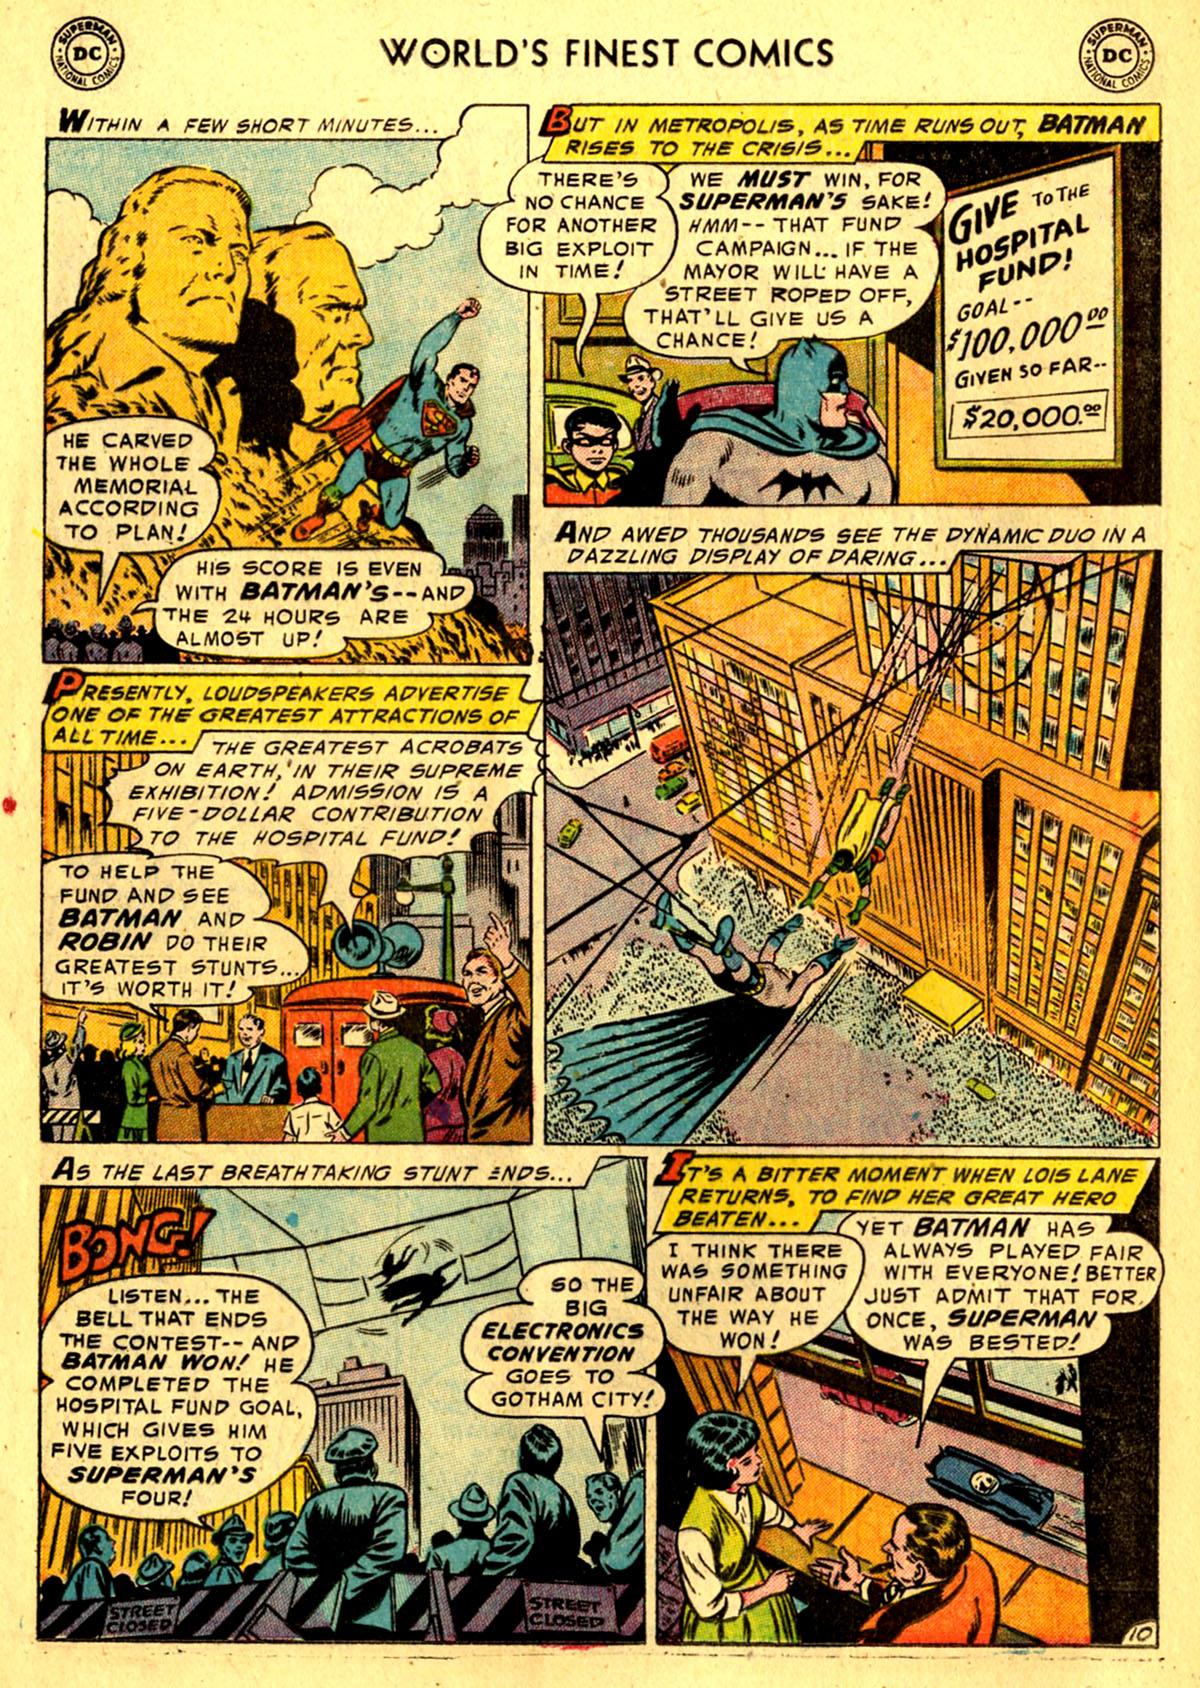 Read online World's Finest Comics comic -  Issue #76 - 12